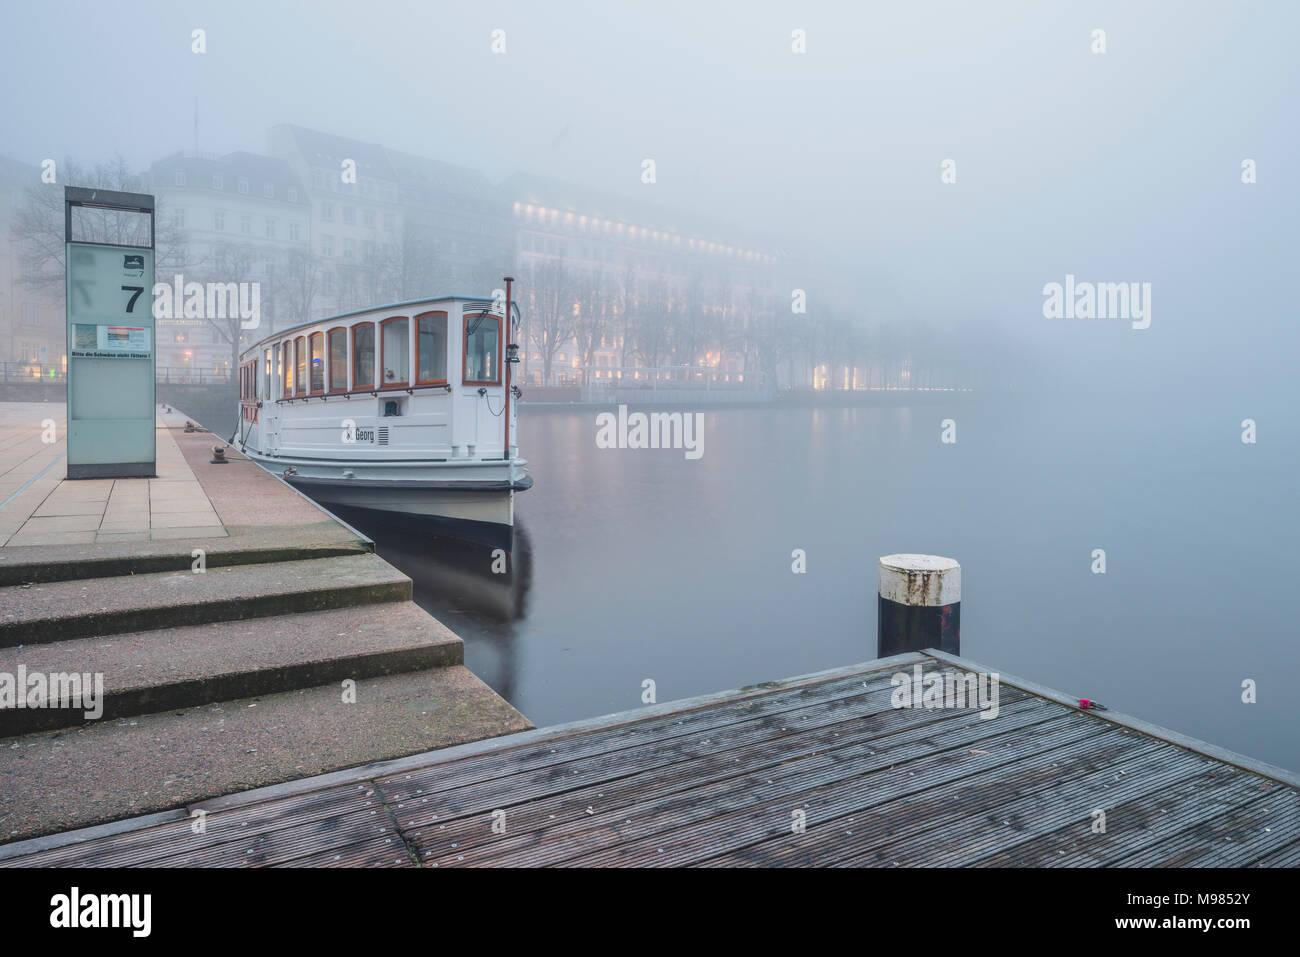 Germany, Hamburg, Jungfernstieg and passenger ship in fog - Stock Image